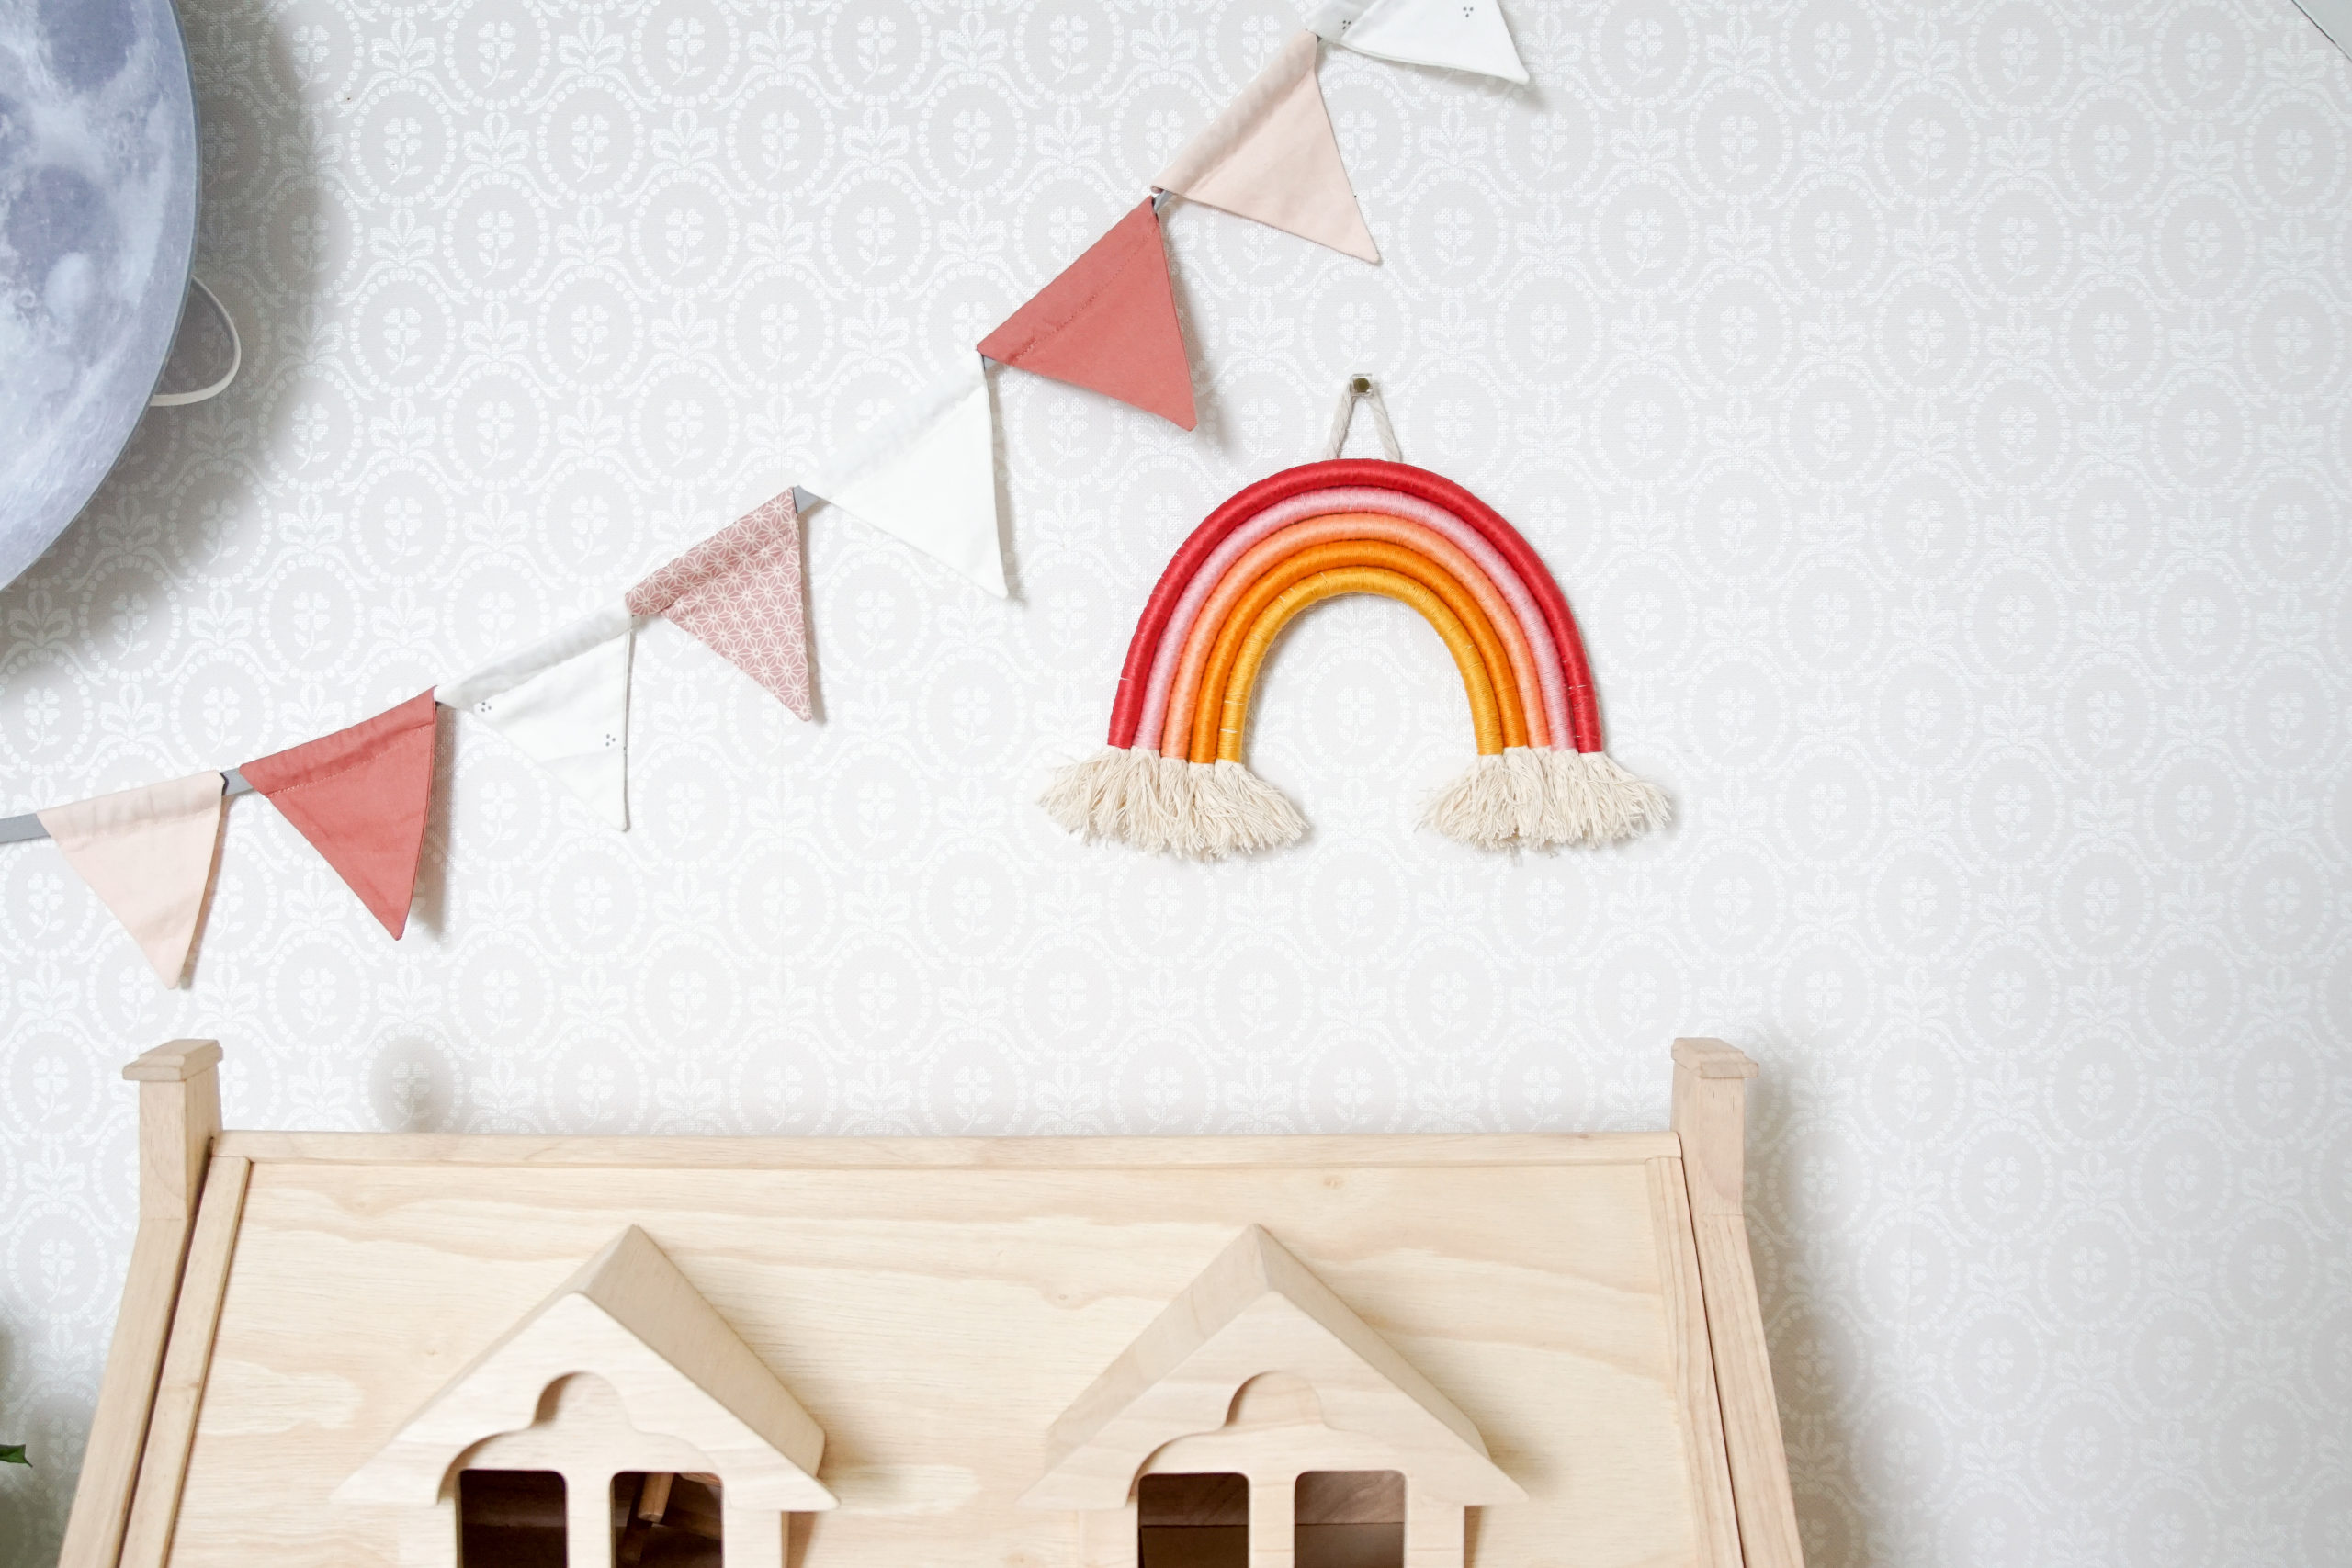 DIY Seil Regenbogen selber machen